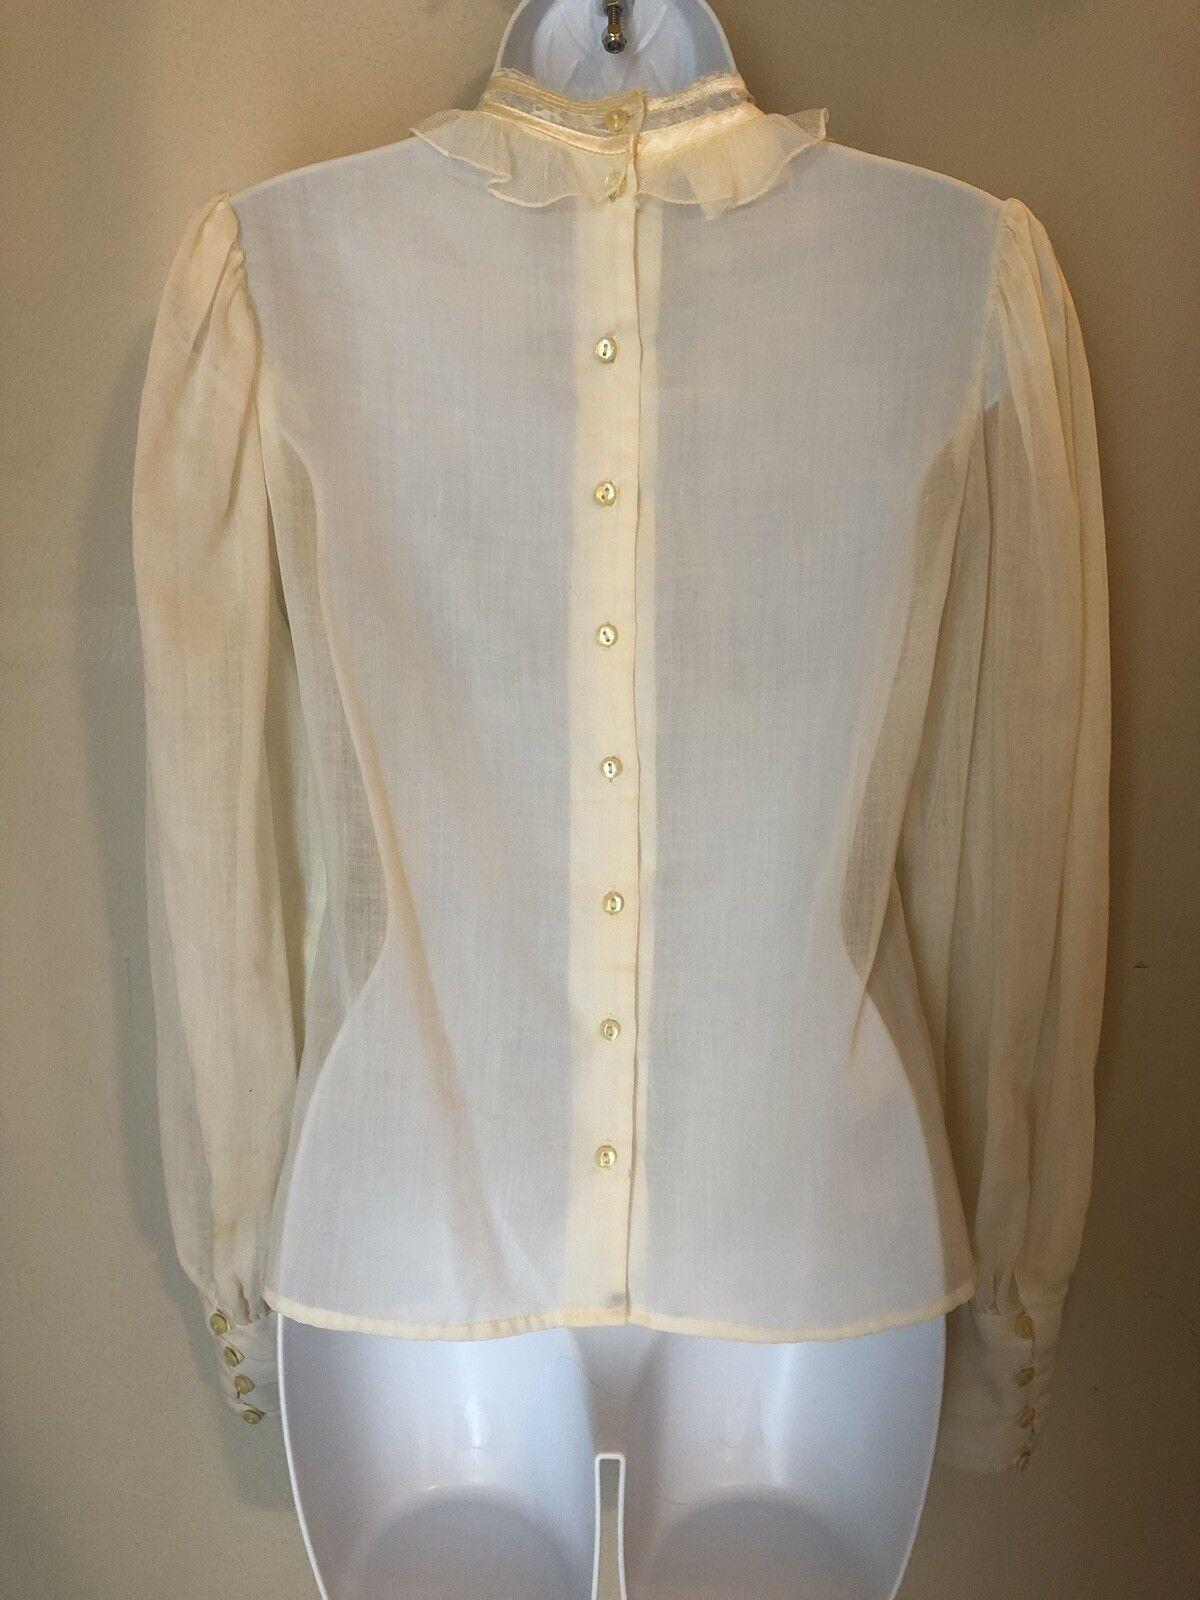 jessicas gunnies vintage blouse - image 4